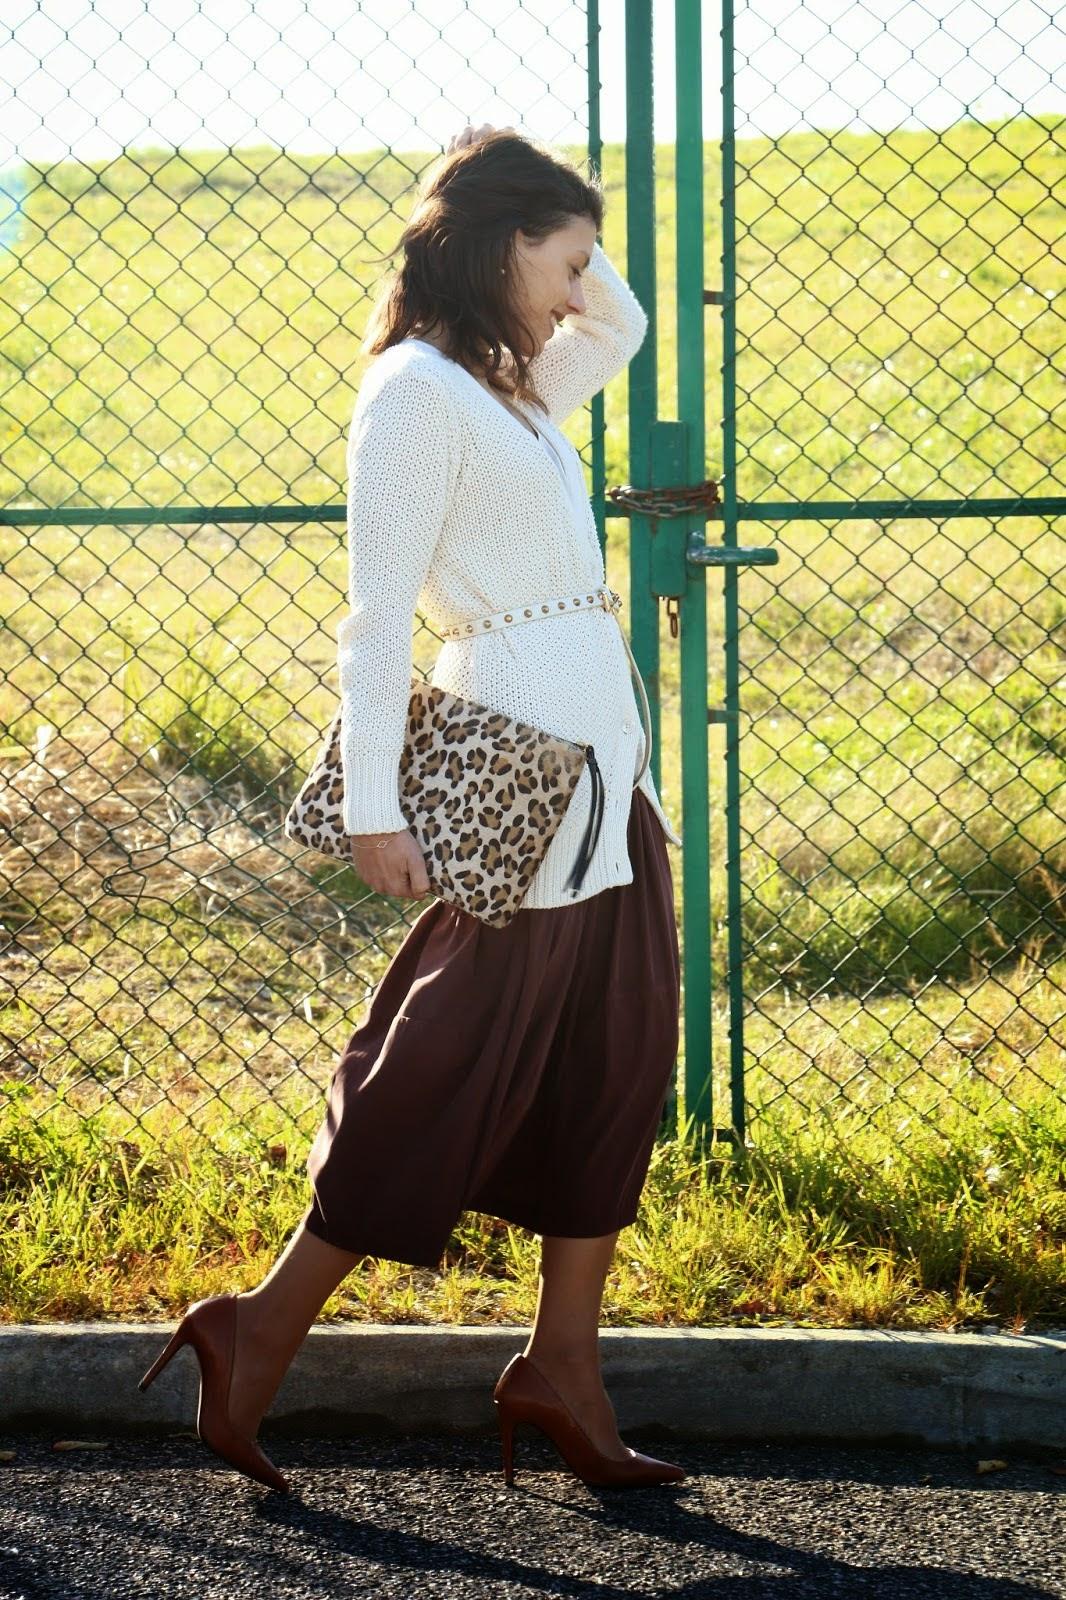 http://ilovefitametrica.blogspot.pt/2015/01/marsala-skirt.html